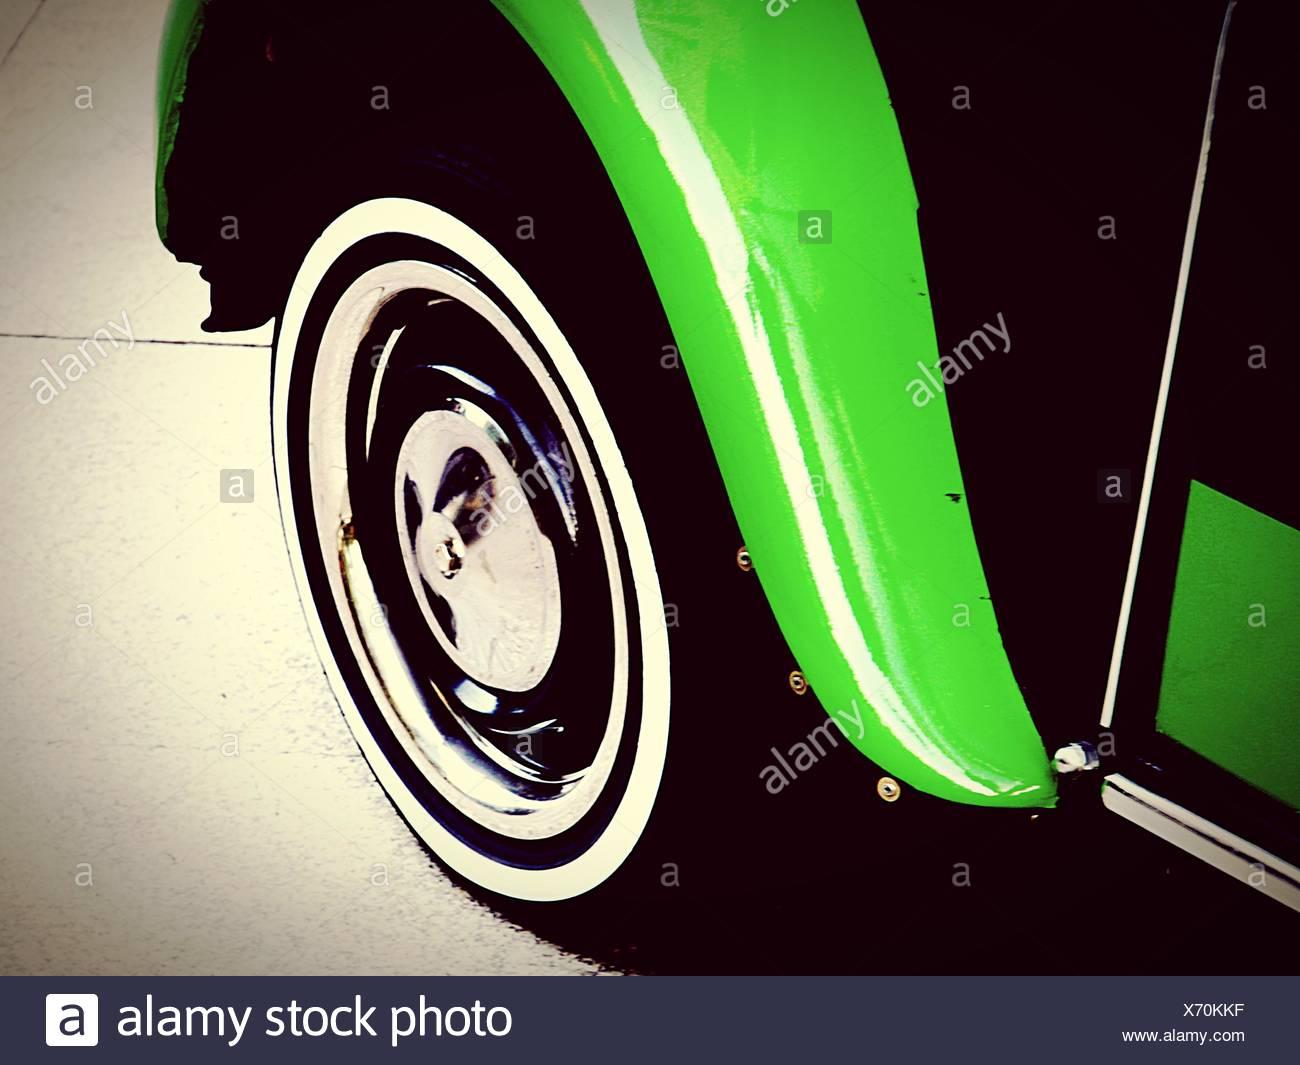 High Angle View Of Green Car Wheel Stockbild